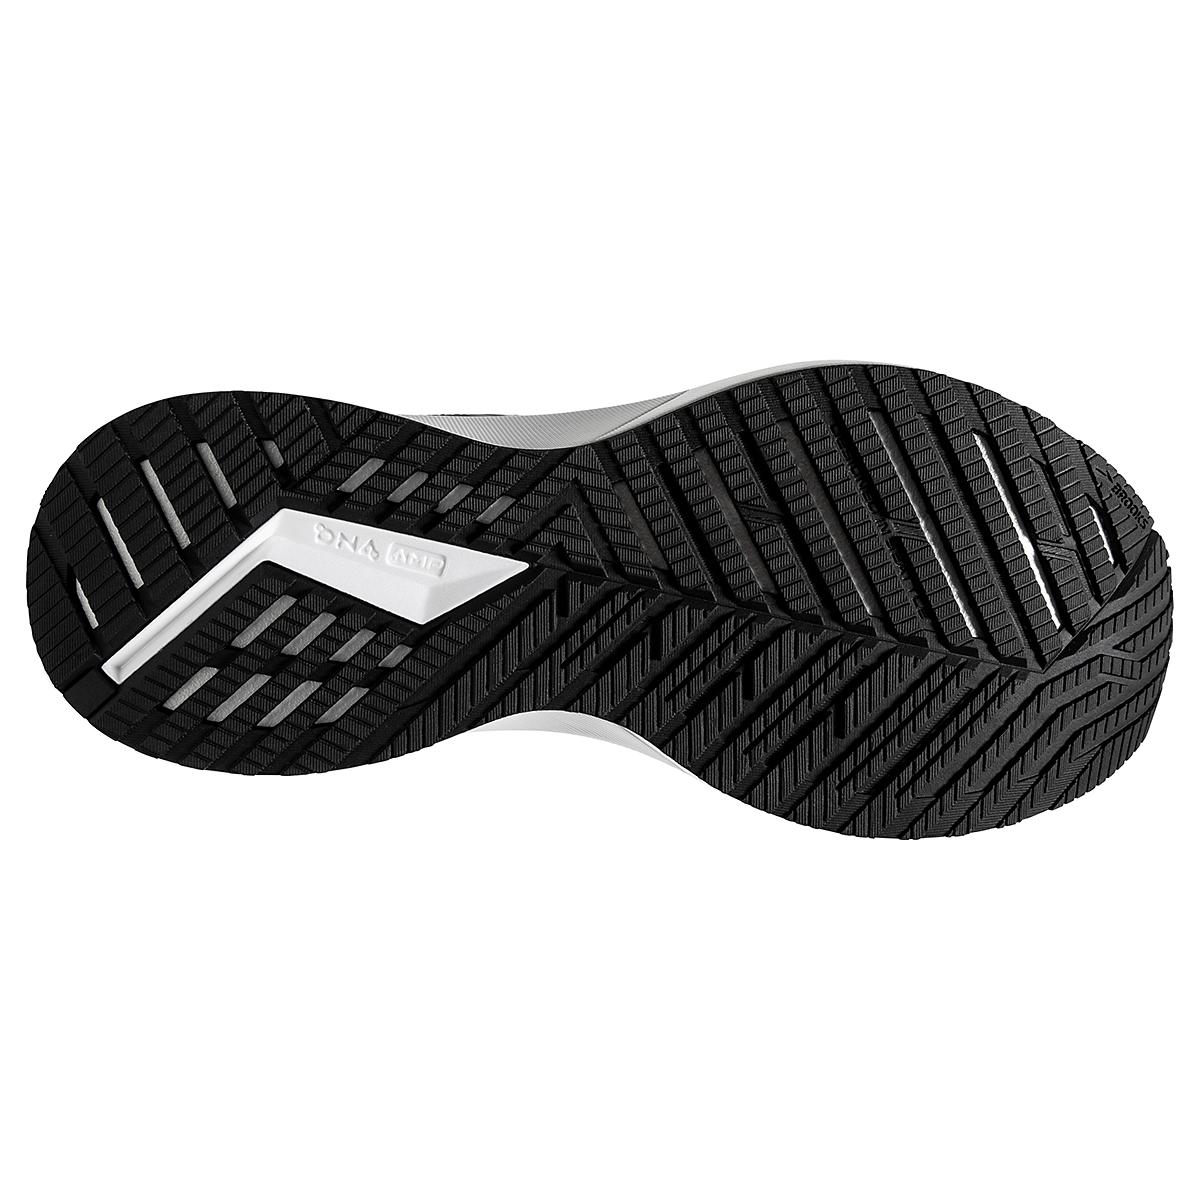 Women's Brooks Levitate 4 Running Shoe - Color: Black/Blackened Pearl/White - Size: 5.5 - Width: Regular, Black/Blackened Pearl/White, large, image 4